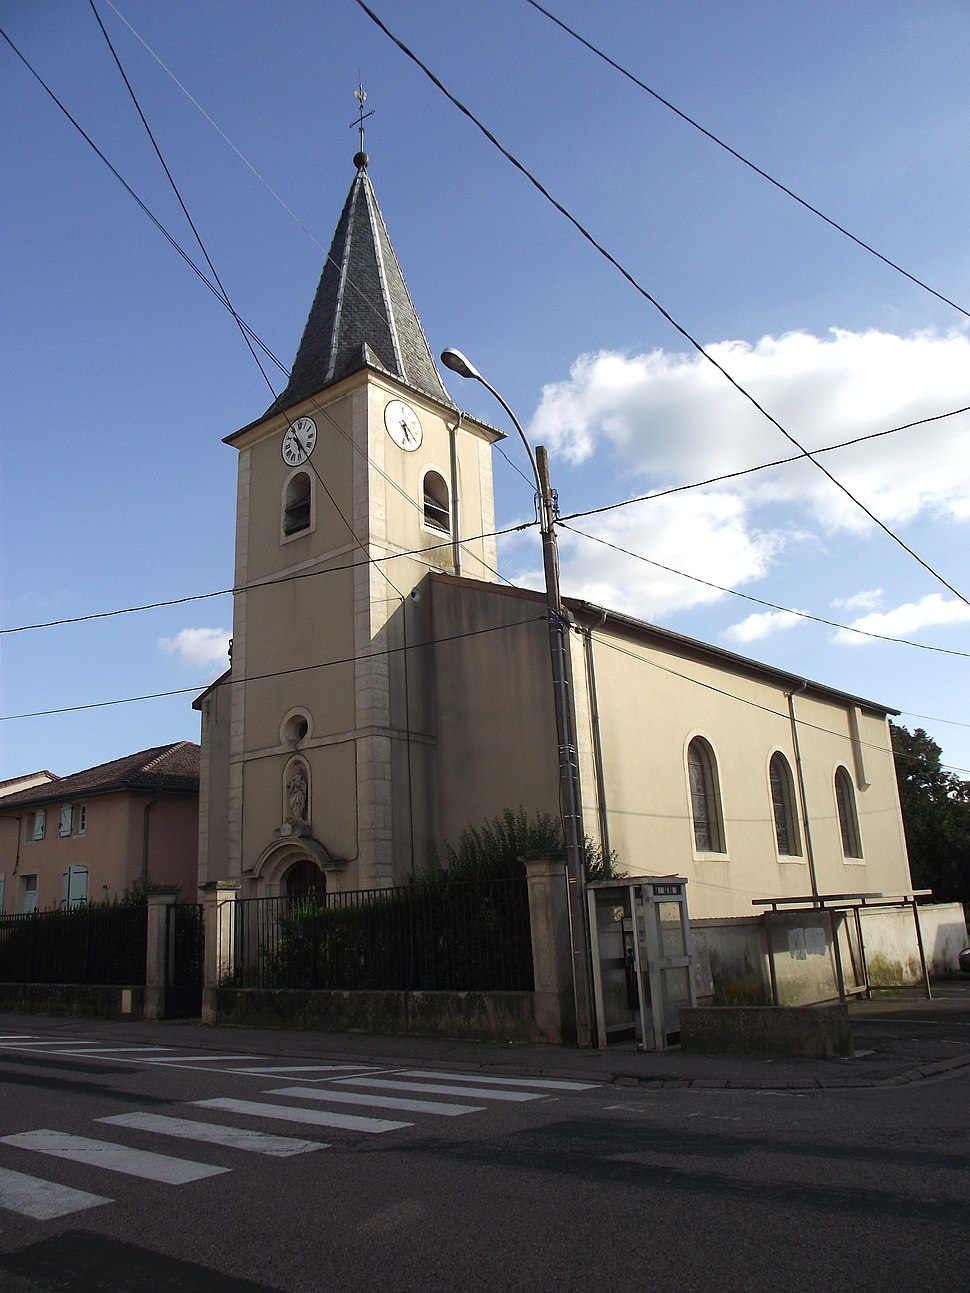 The church in Bicqueley